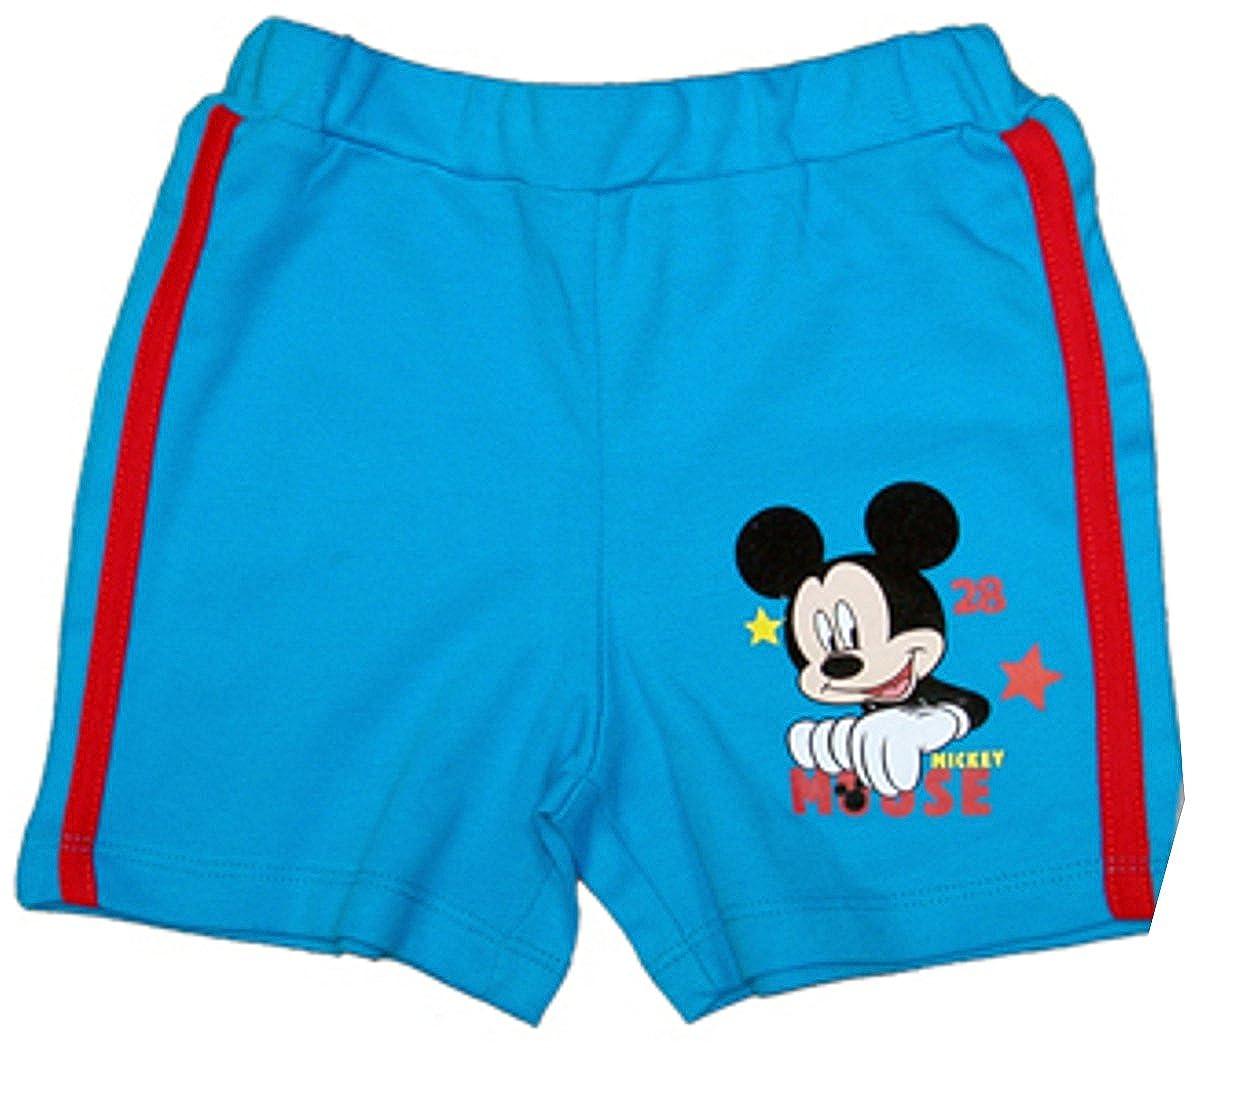 Kurze Hose, blau oder grau, Baby Kleinkind Shorts Mouse, jungen Disney Minnie Mouse Maus KSH6201